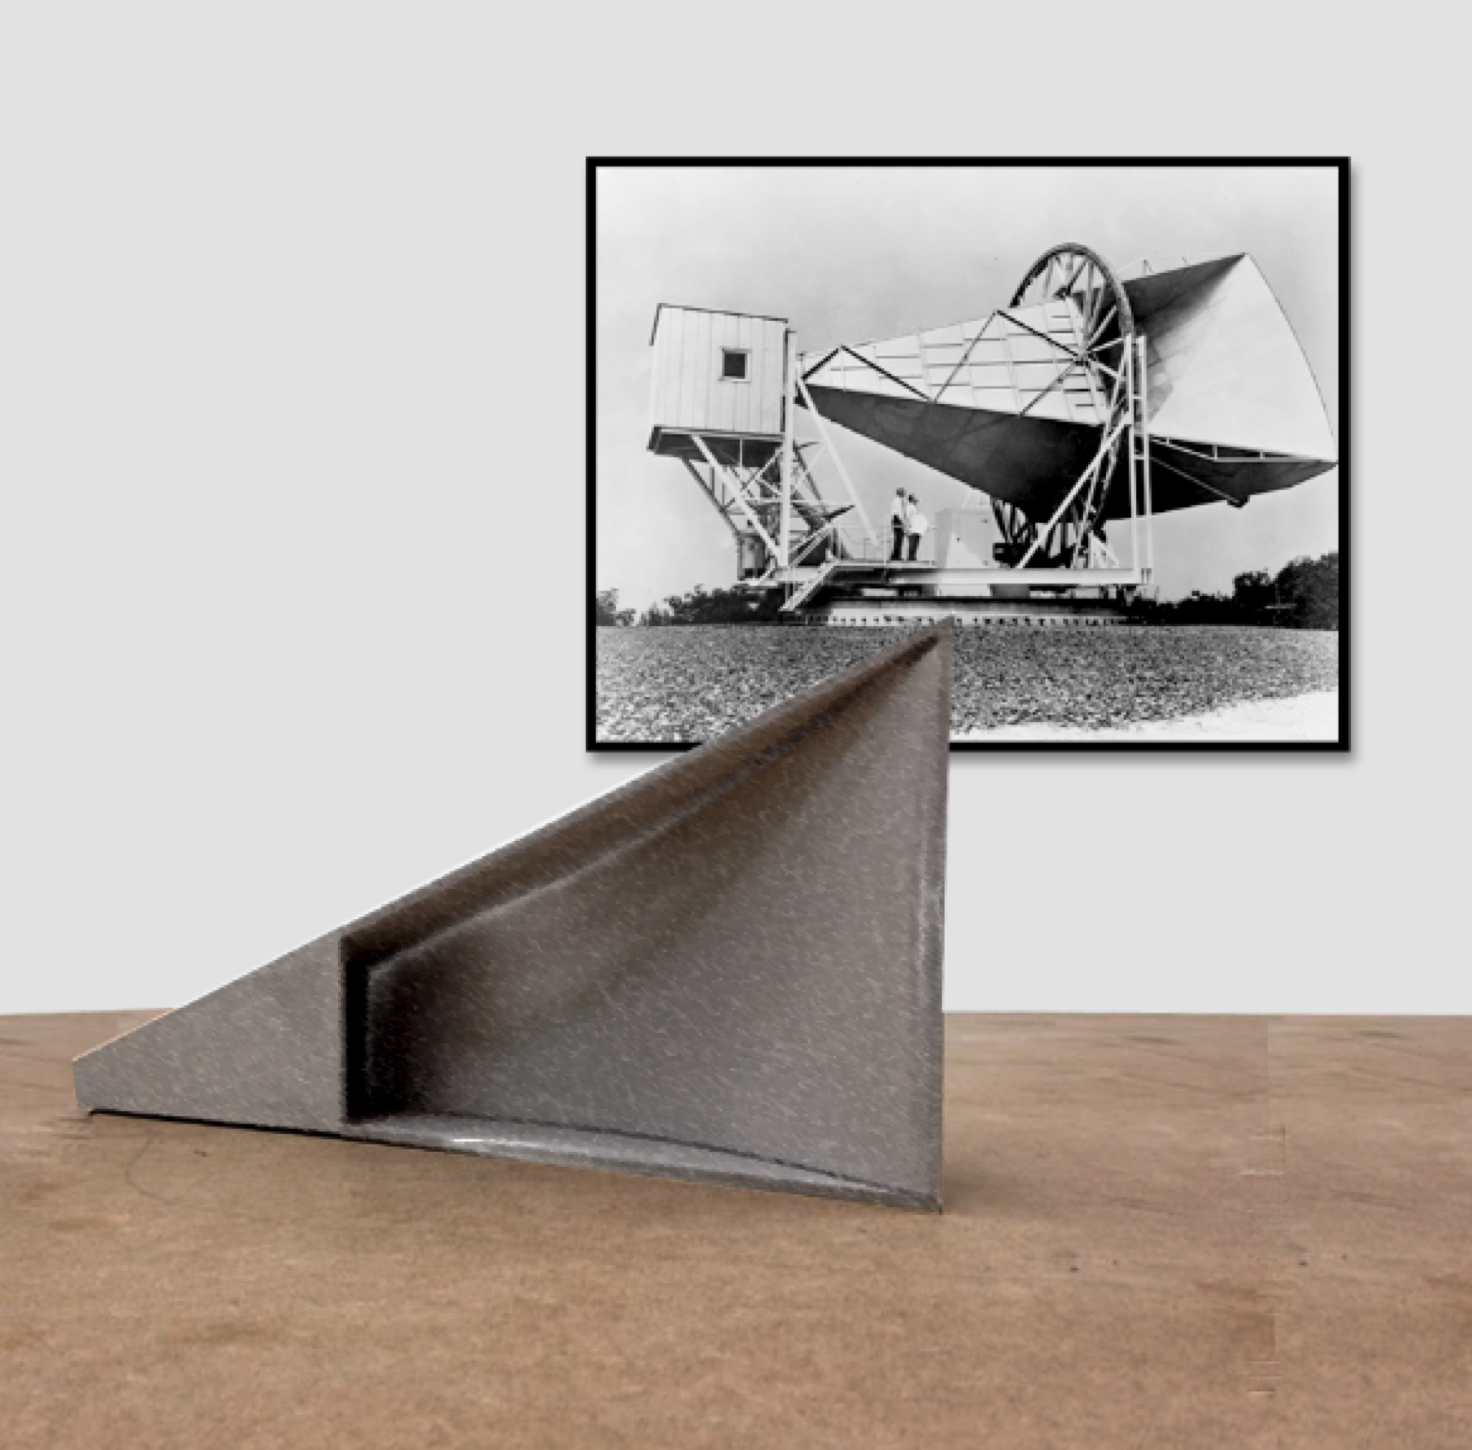 Emilio Chapela, Holmdel Antenna, lámina de fierro, impresión digital, ed. 1 + AP, 2014